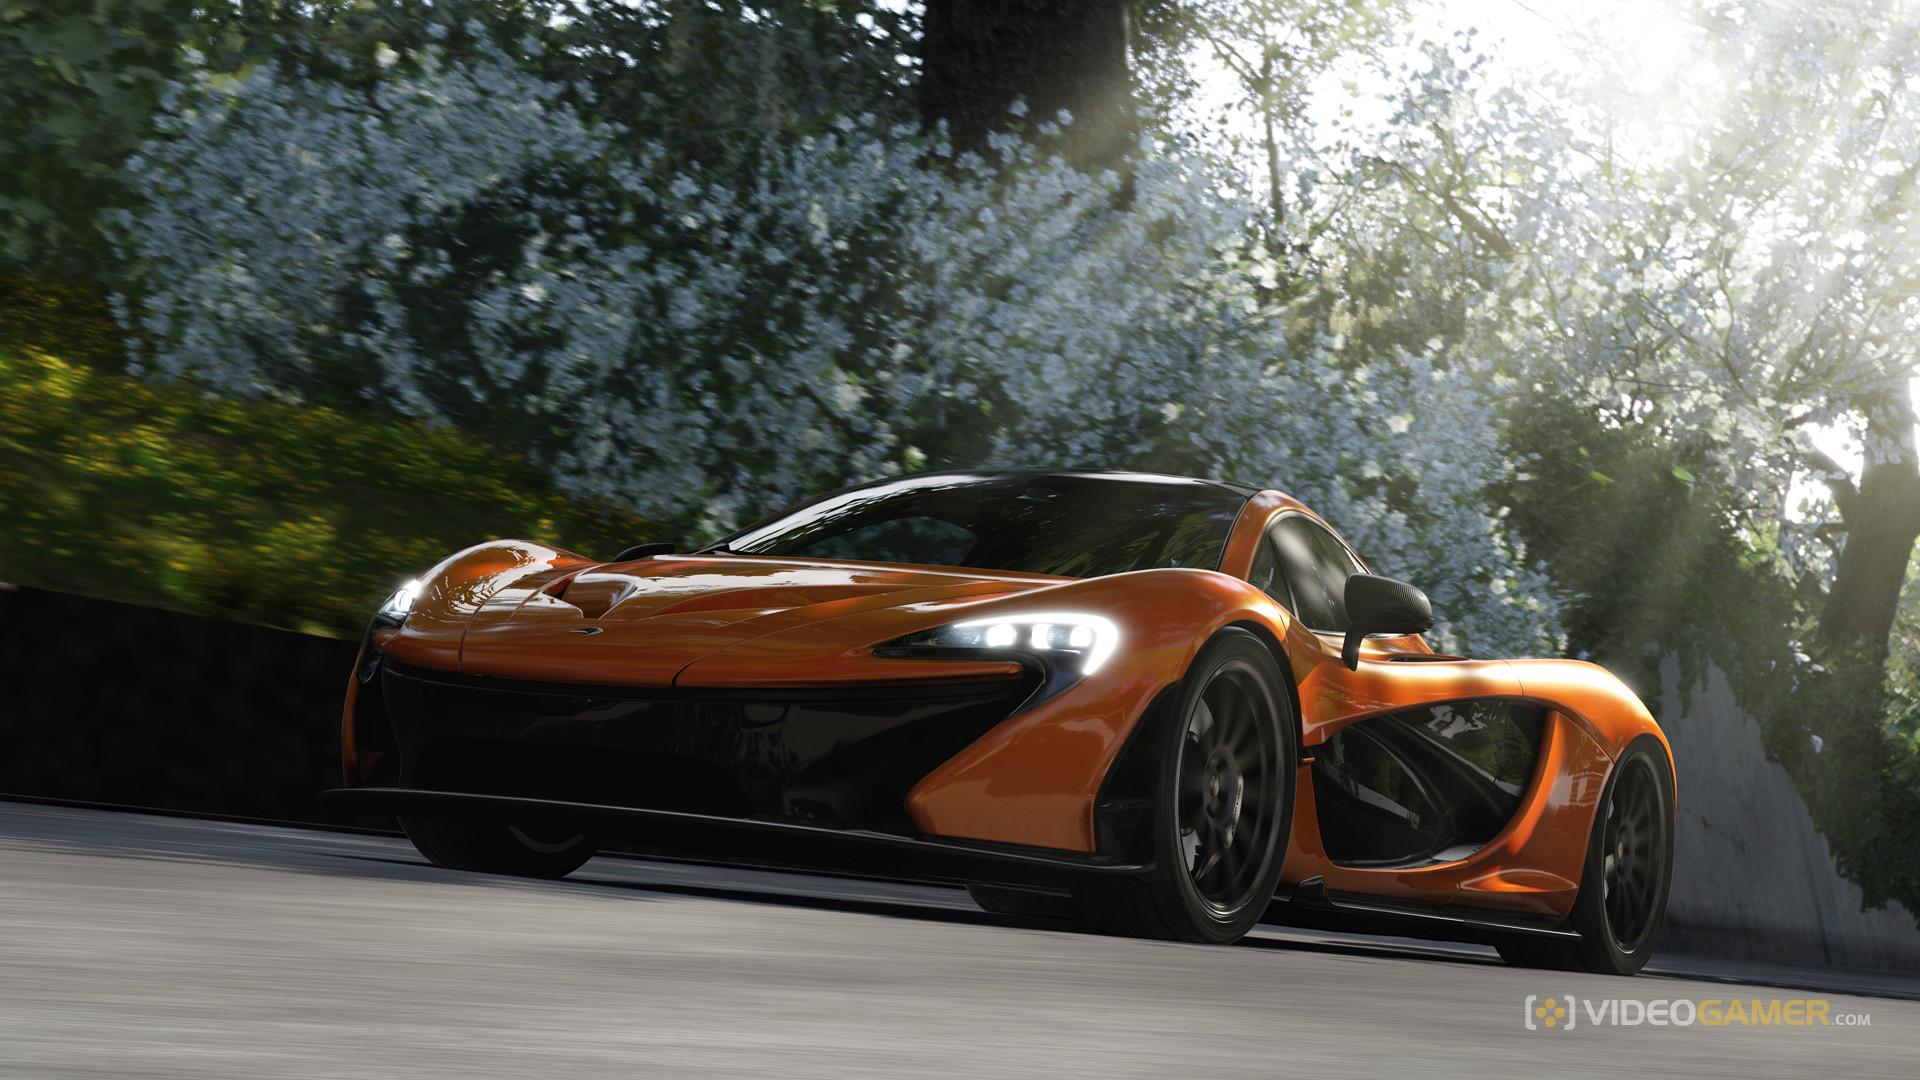 Forza Motorsport 5 screenshot 6 for Xbox One   VideoGamercom 1920x1080